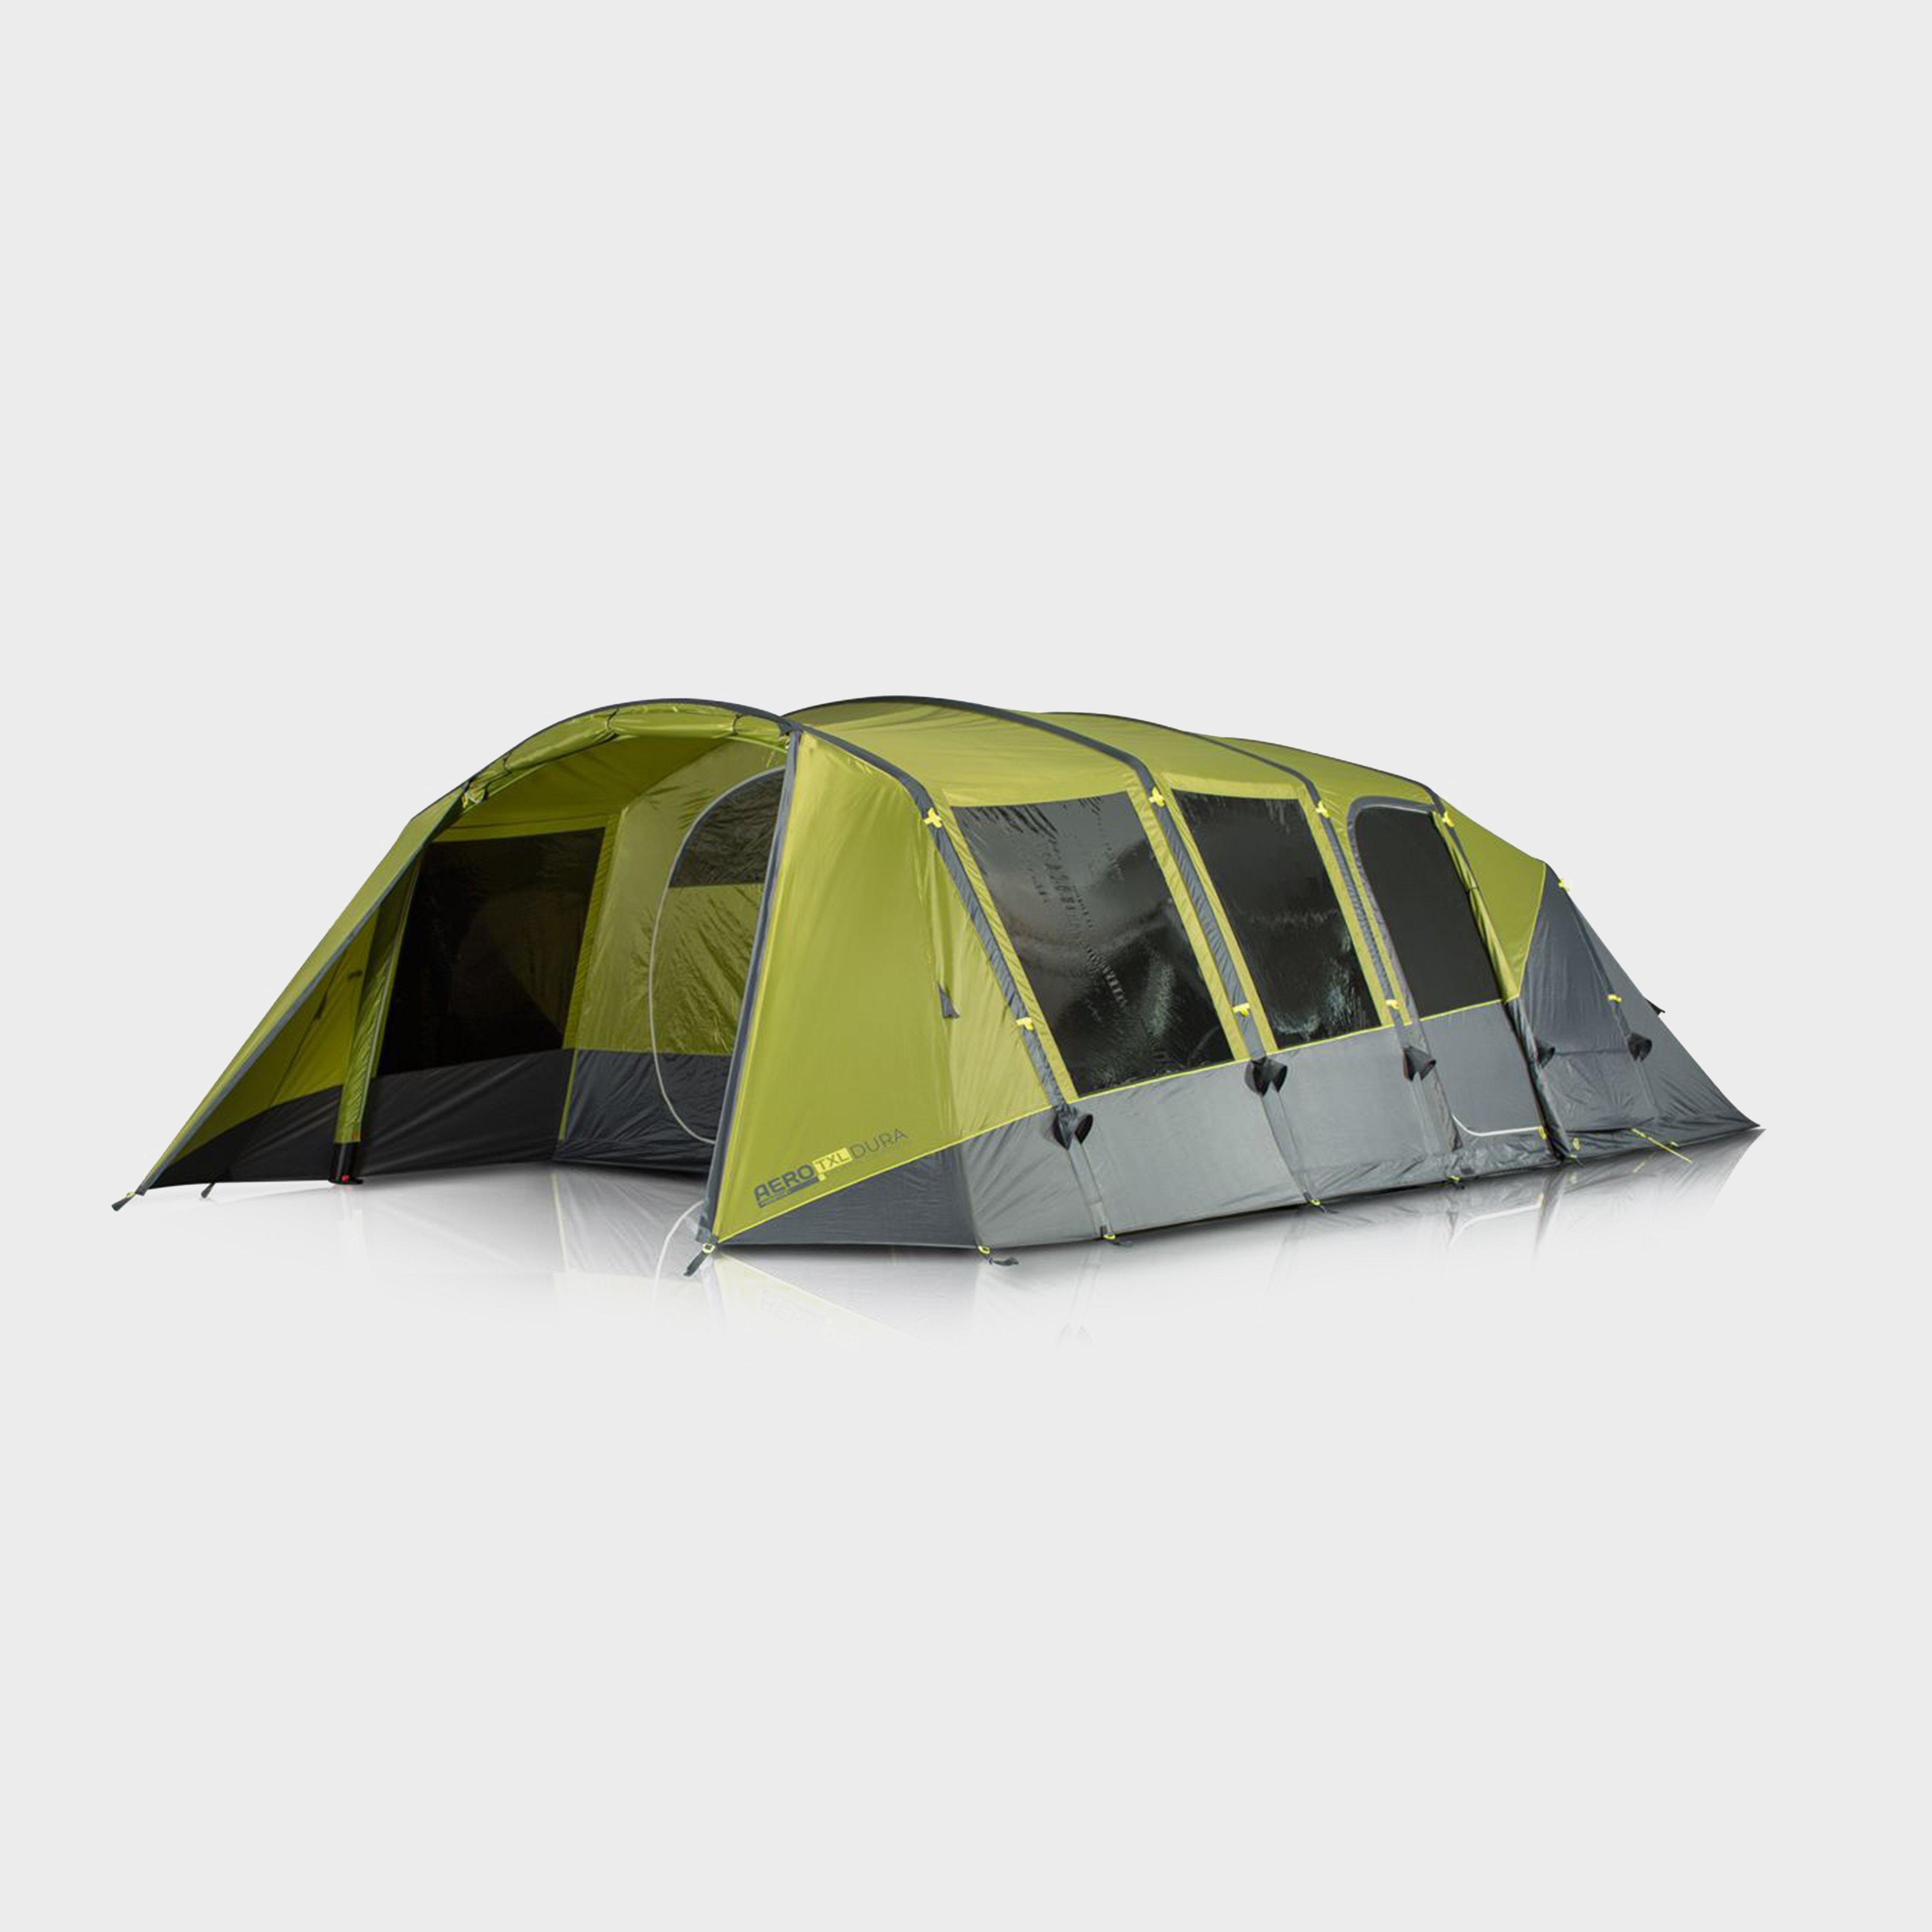 Zempire Aero Dura Txl Air Tent - Green/Ggn, Green/GGN